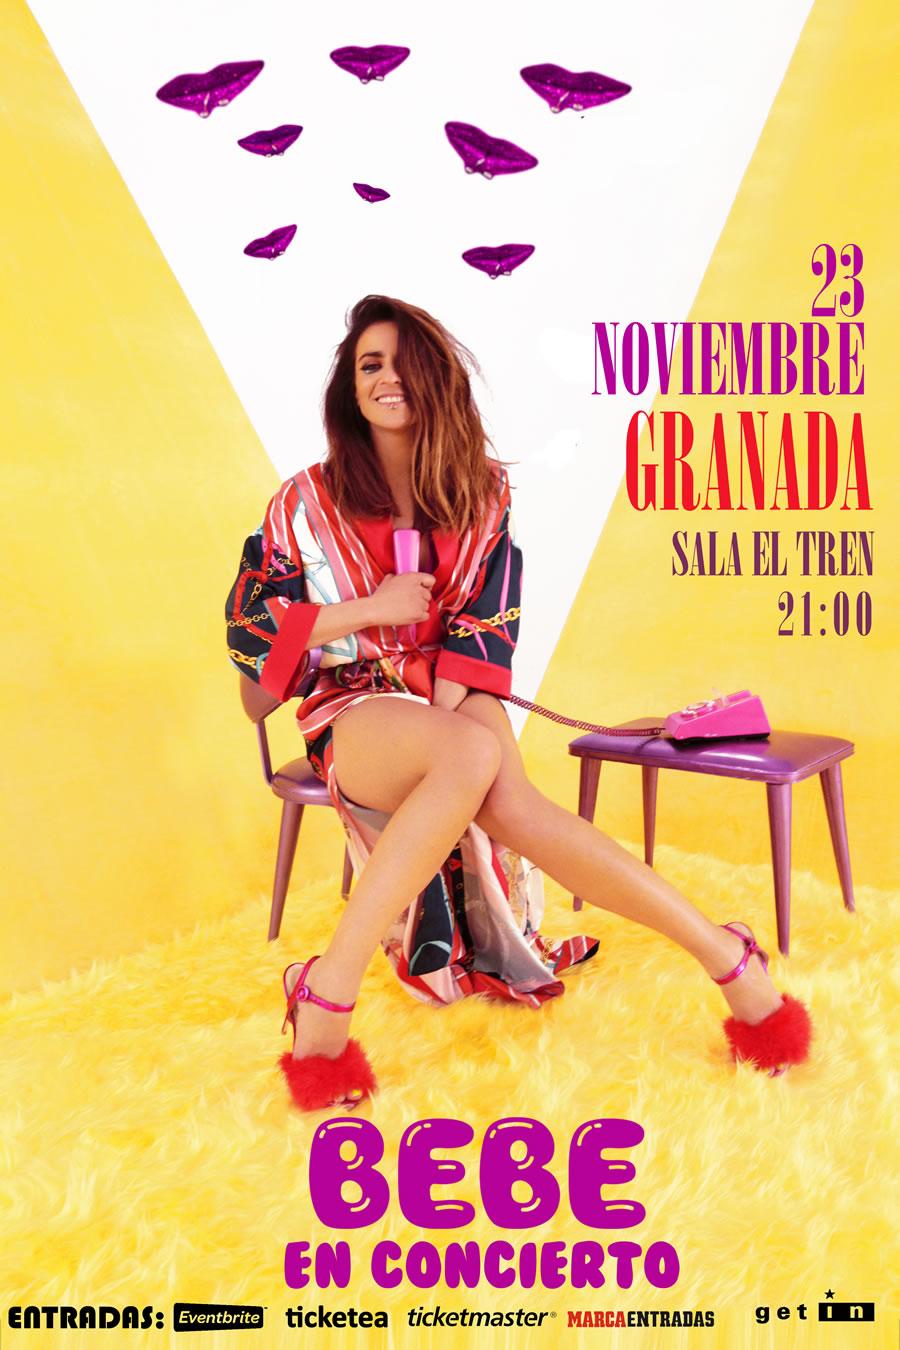 Bebe Granada